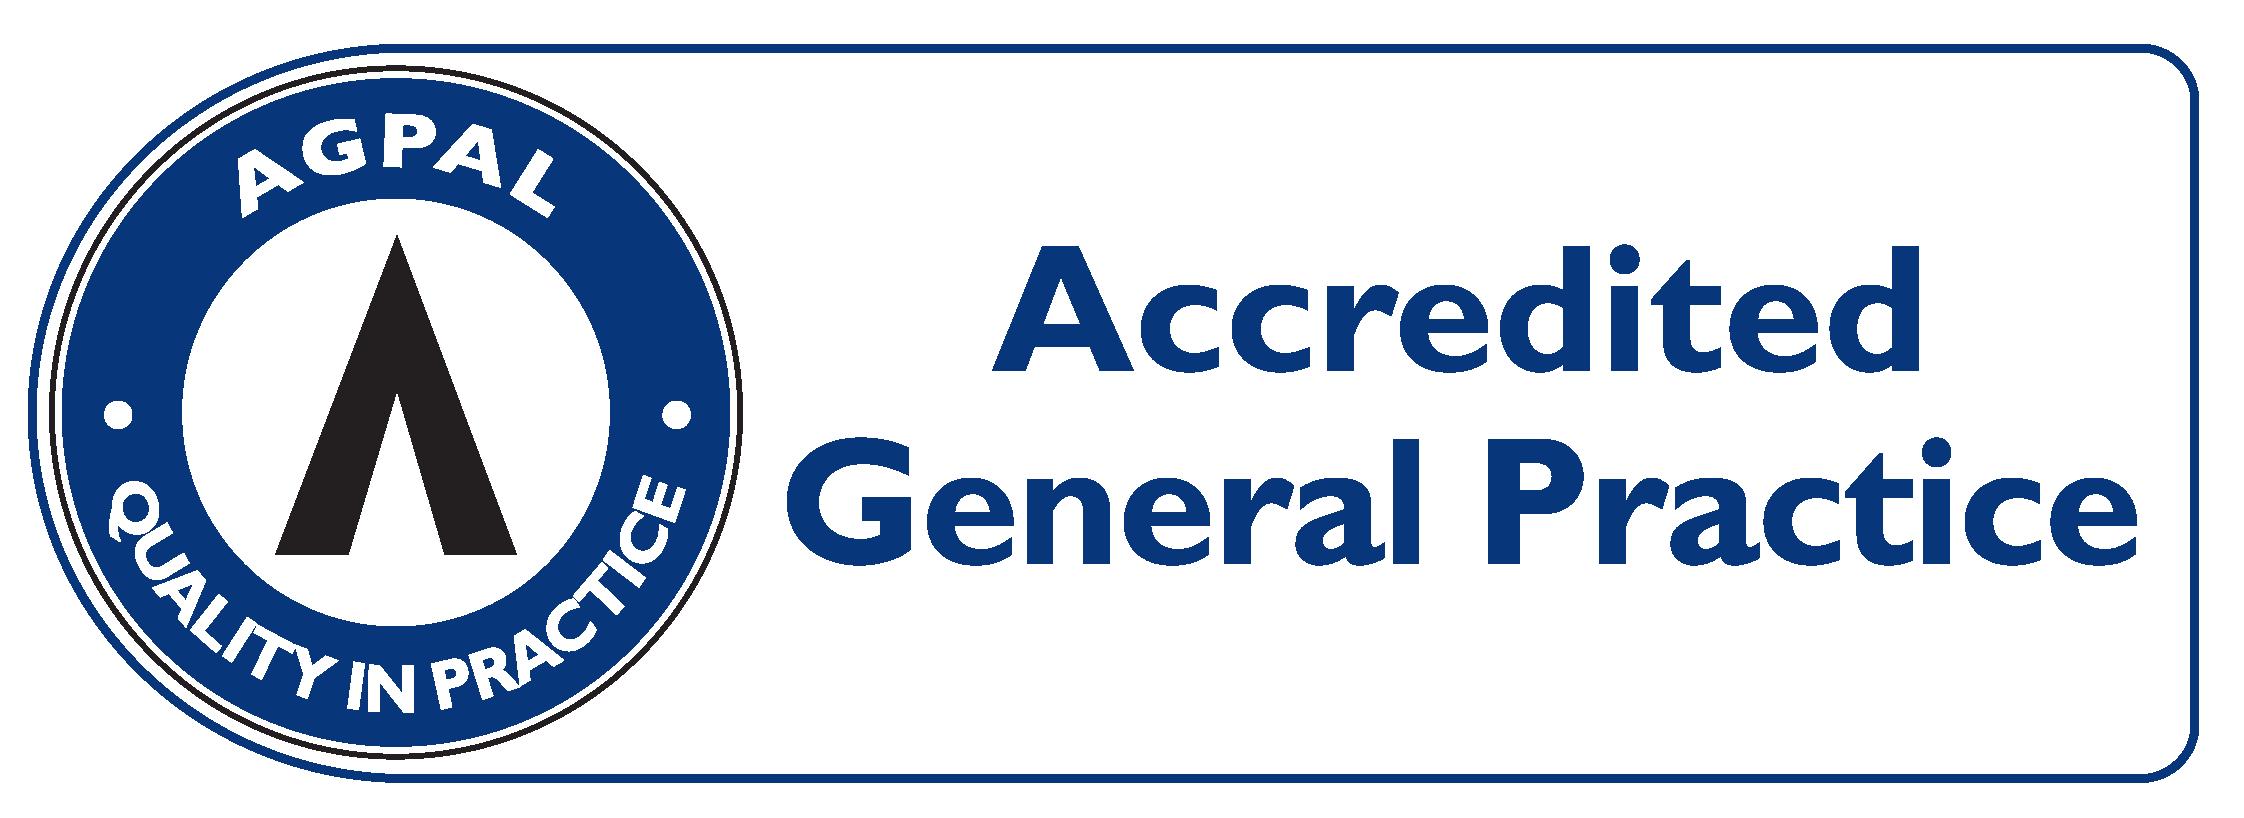 AGPAL-General-Practice.png